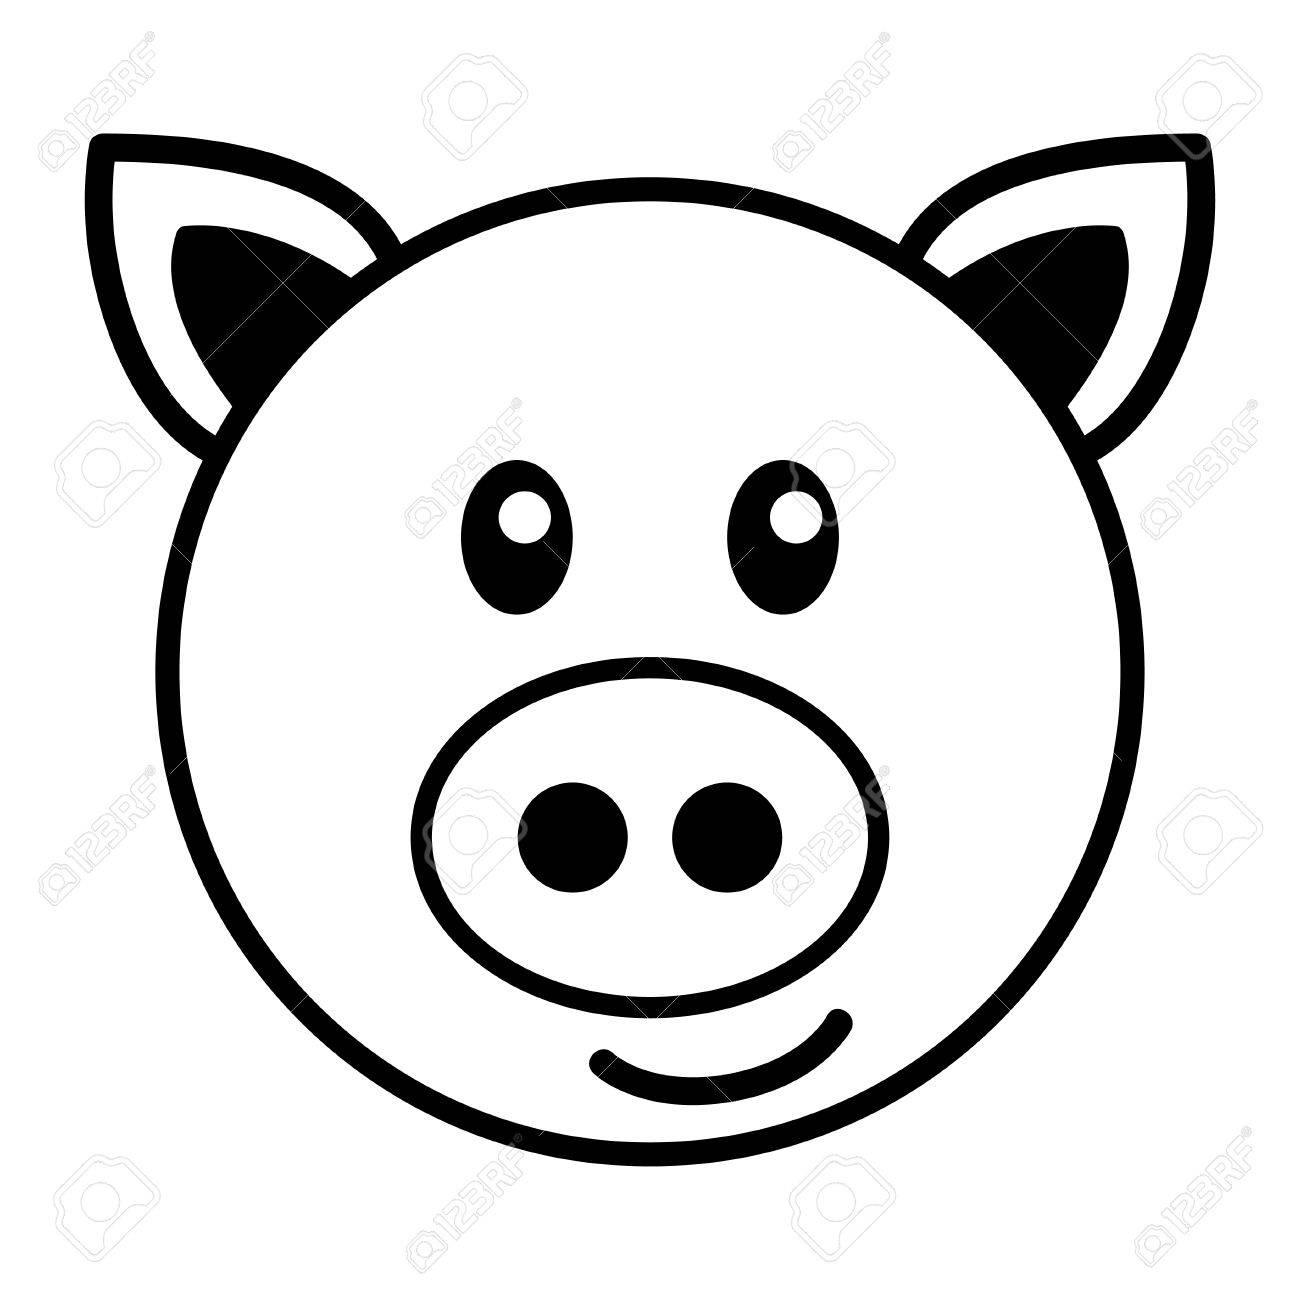 Pig Drawing Images At Getdrawings